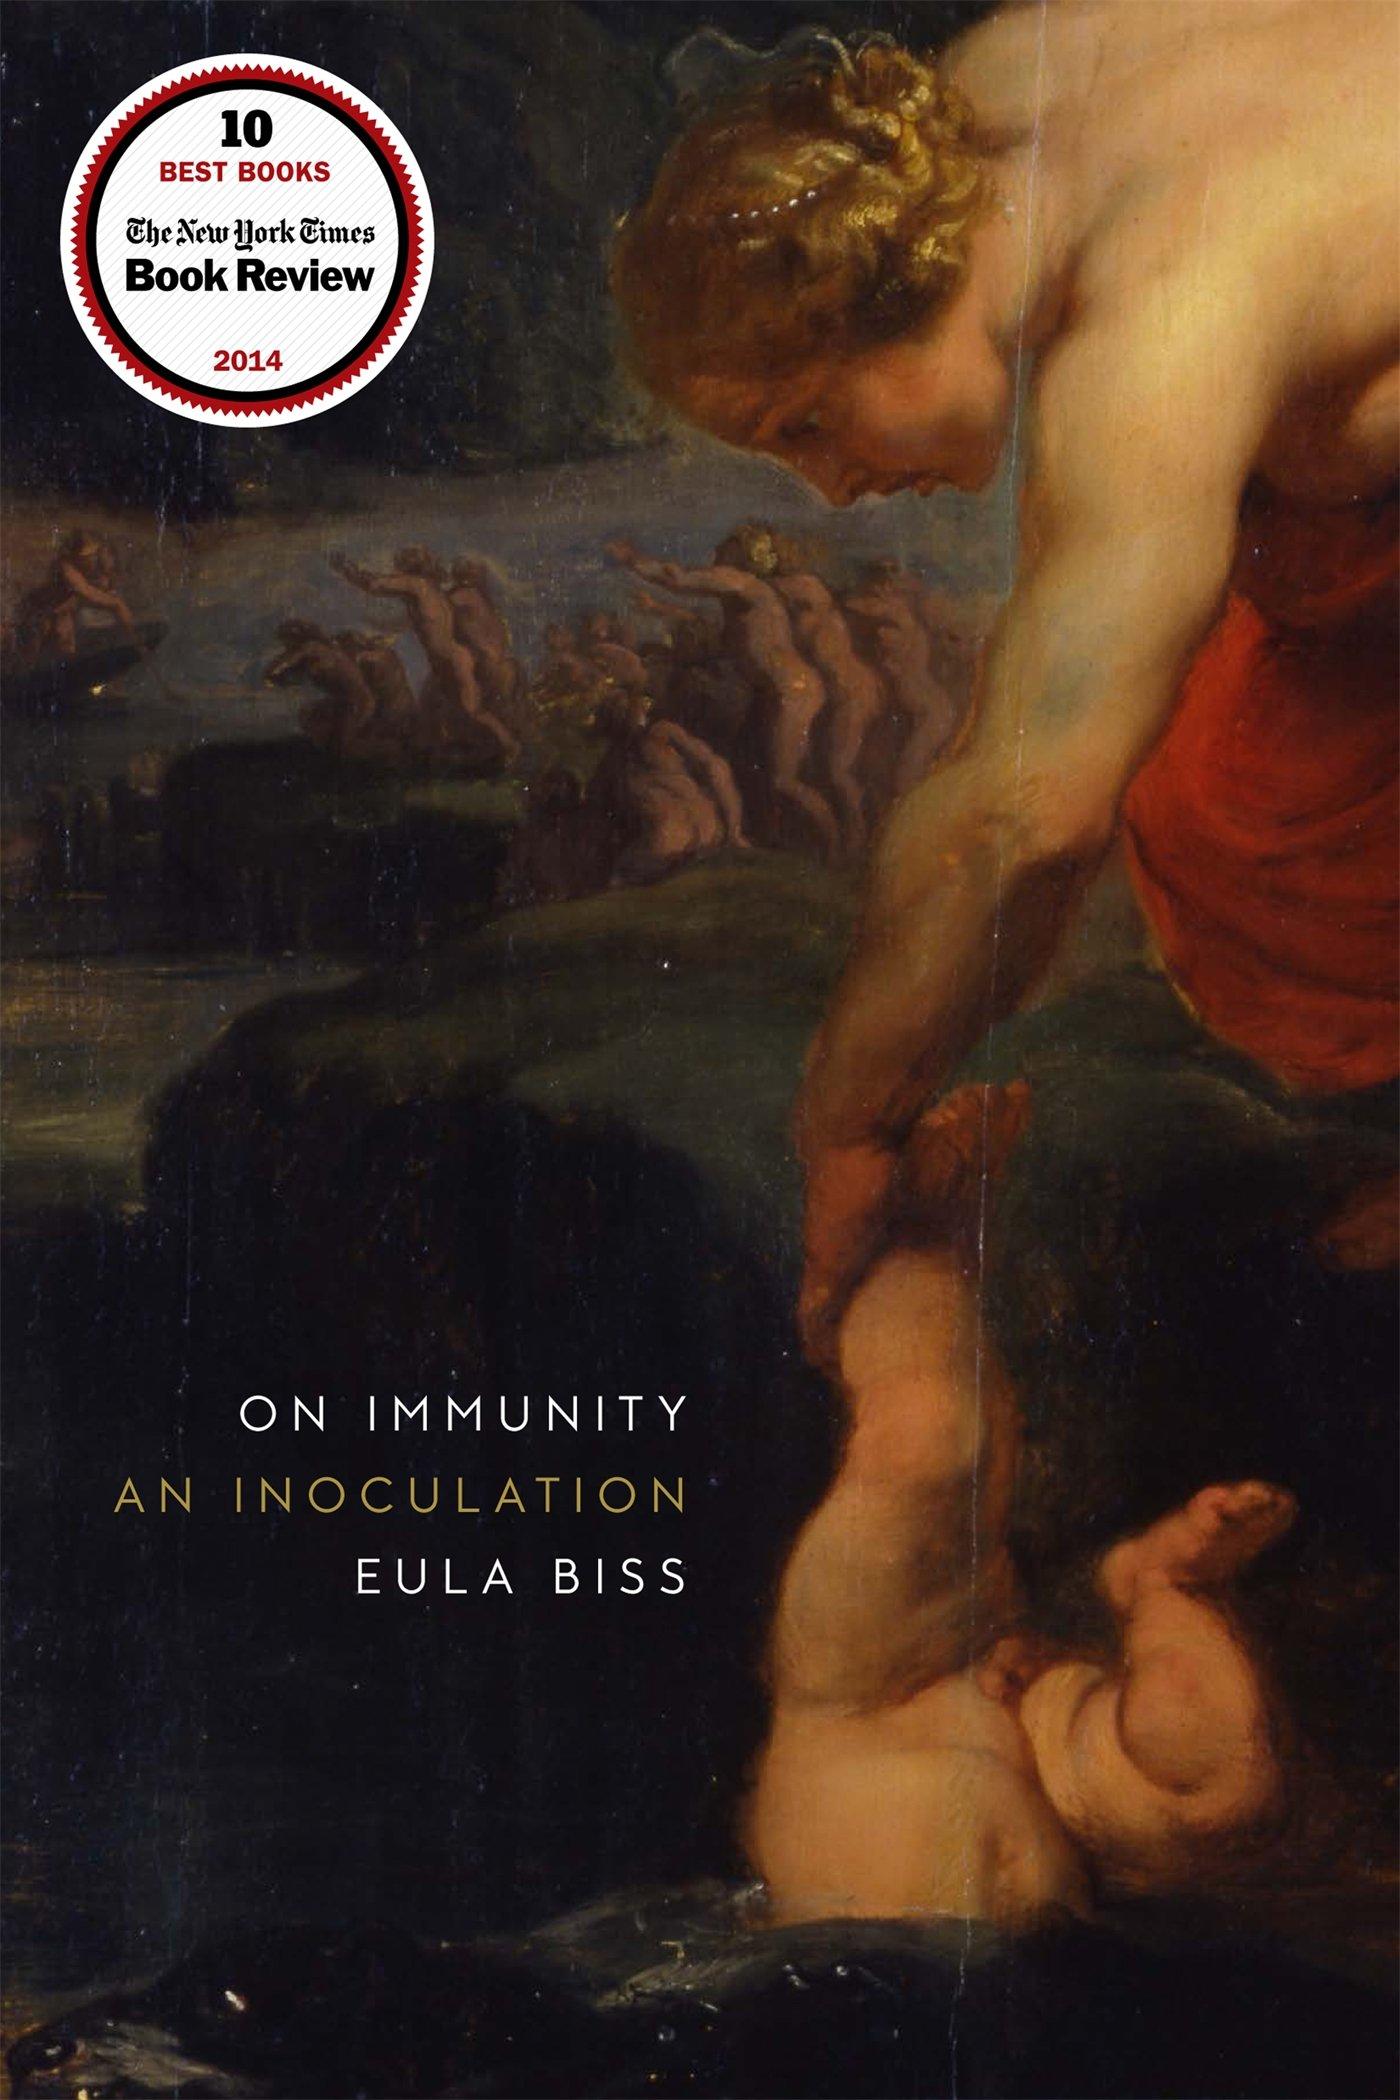 On Immunity ISBN-13 9781555977207